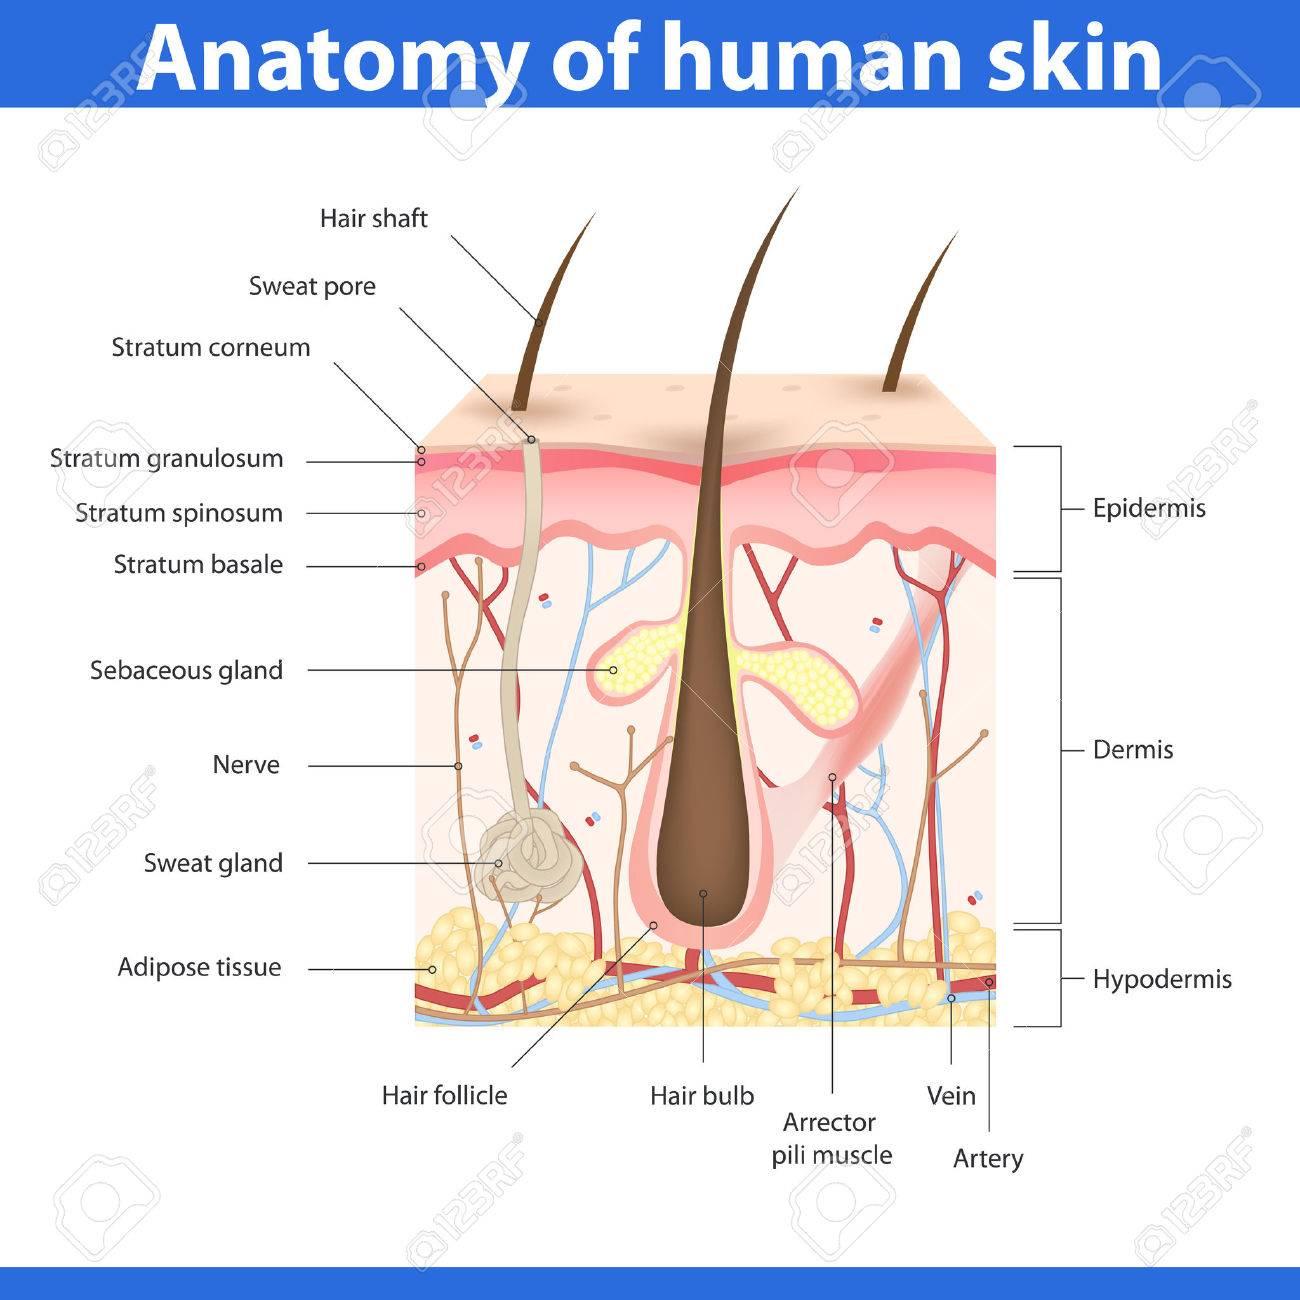 Structure Of Human Skin Detailed Description Illustration Royalty